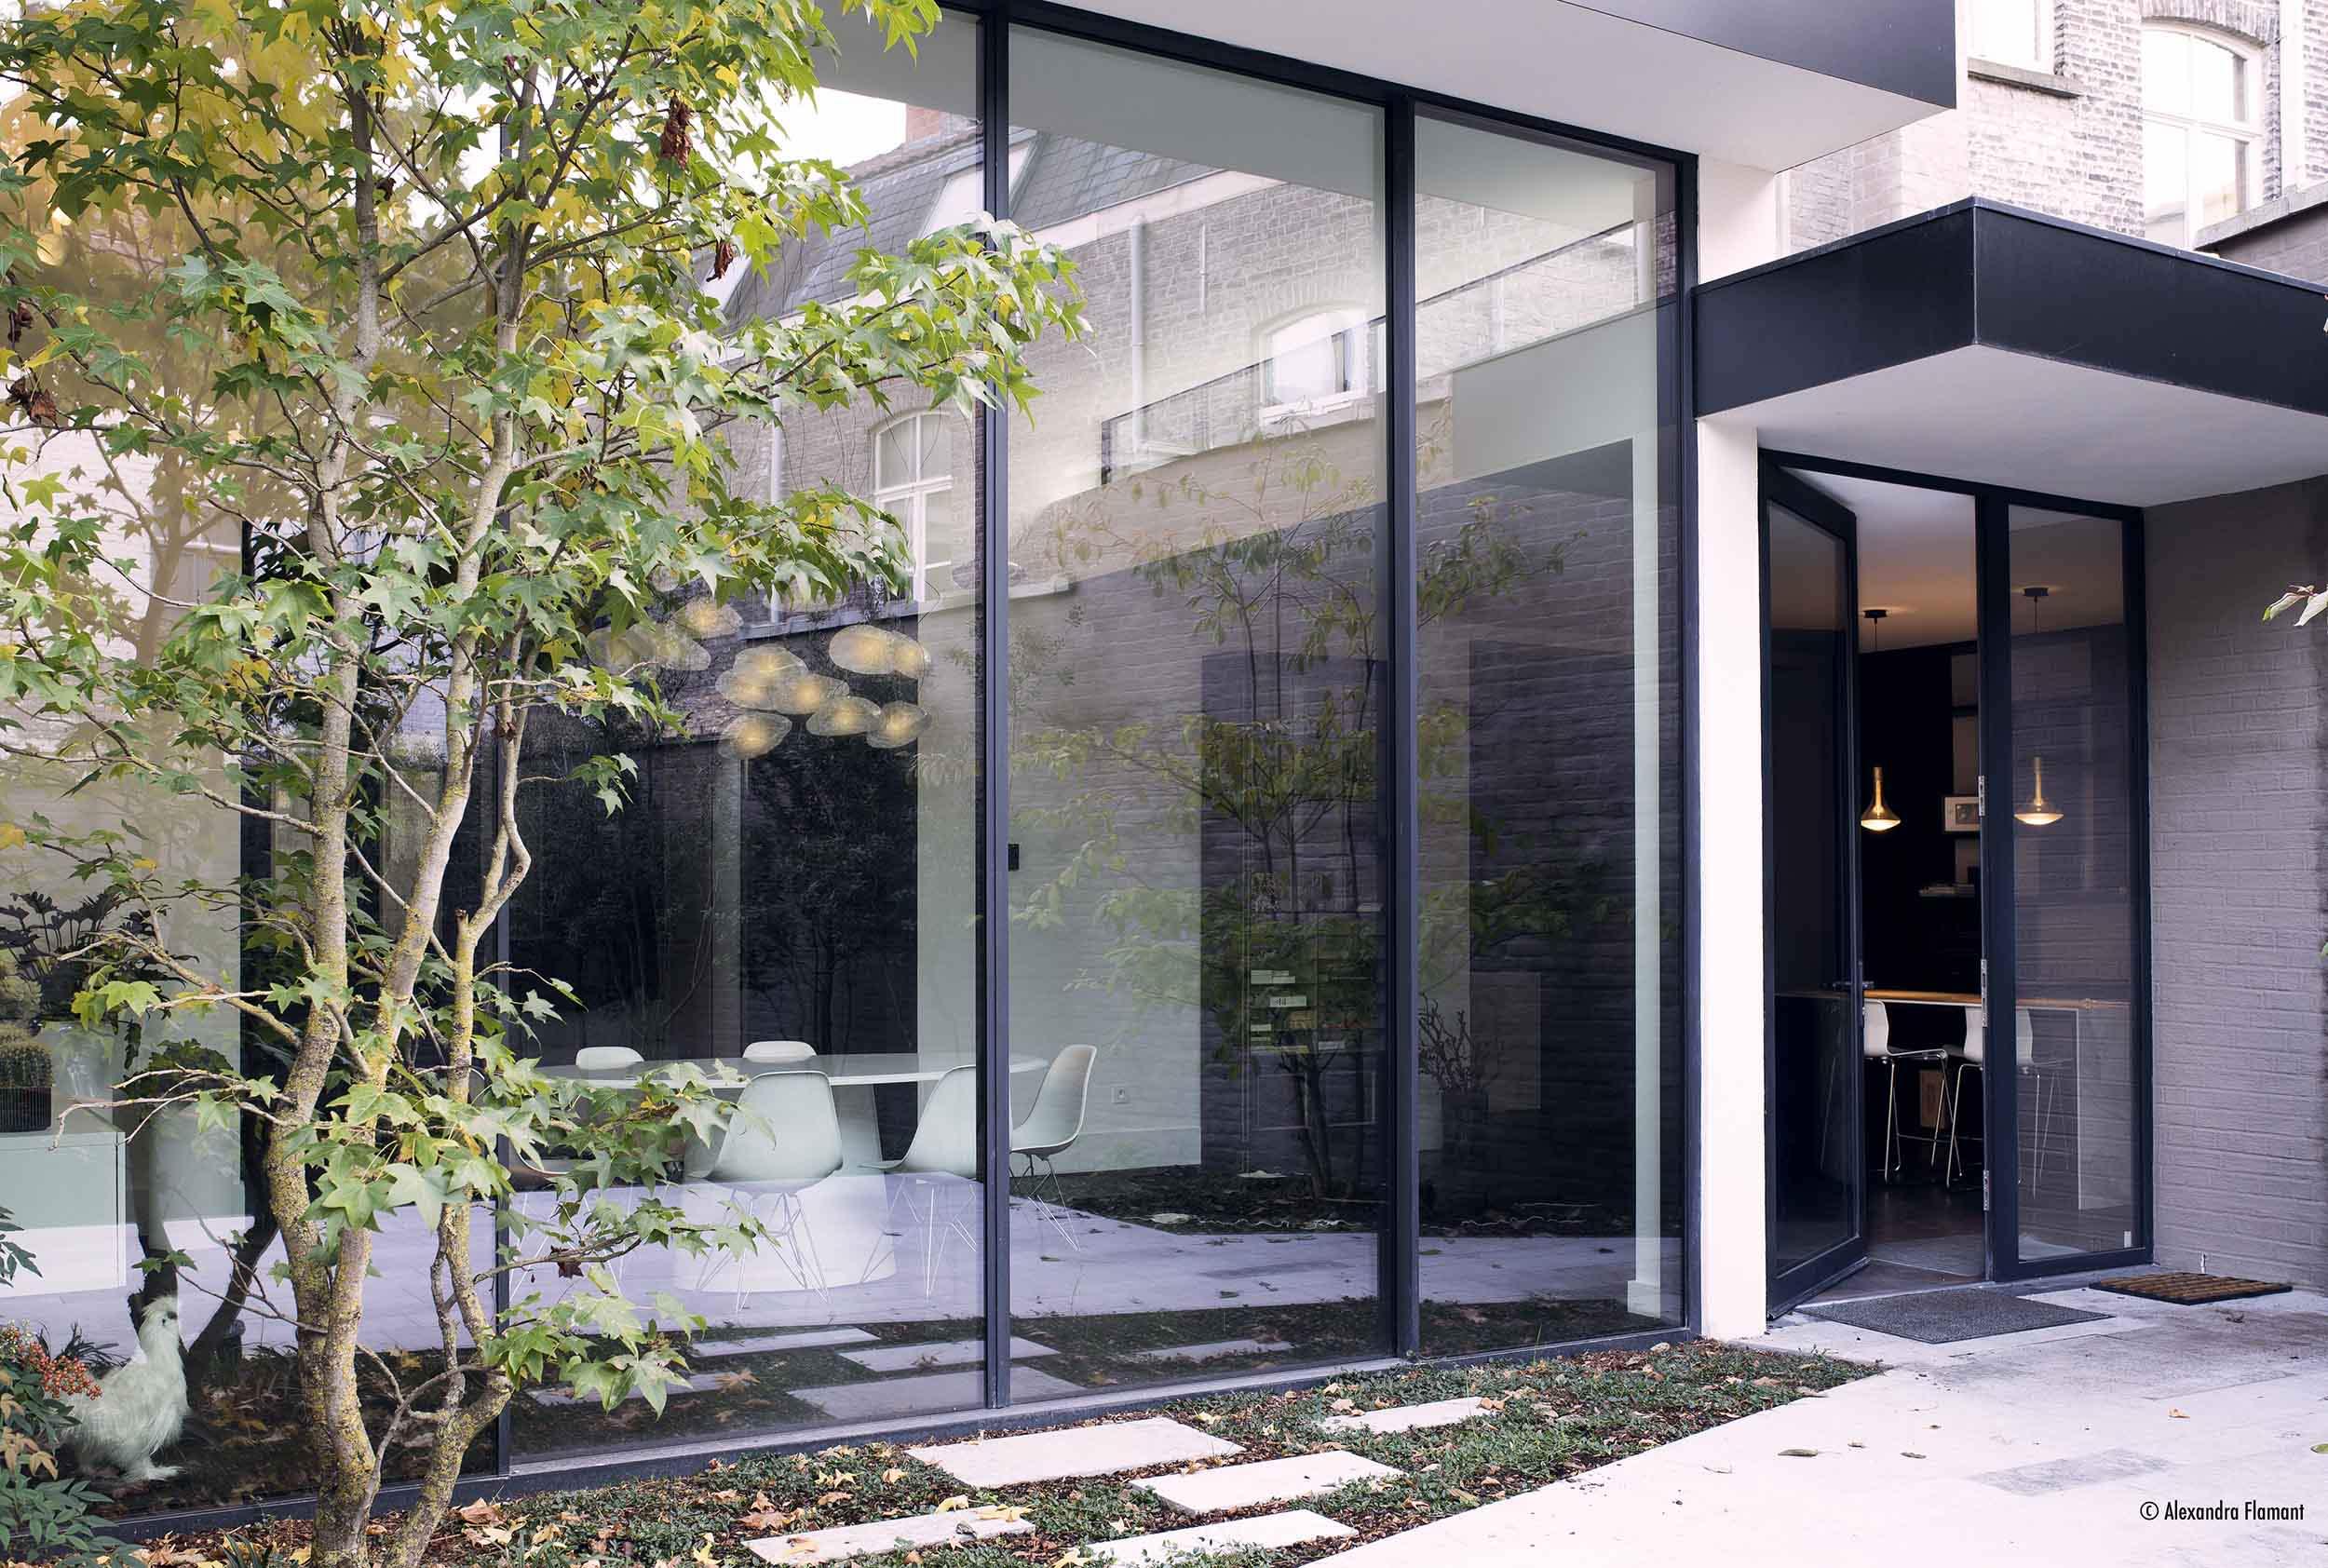 Aluminium Sliding Doors VS uPVC Sliding Doors: Which Is More Secure?